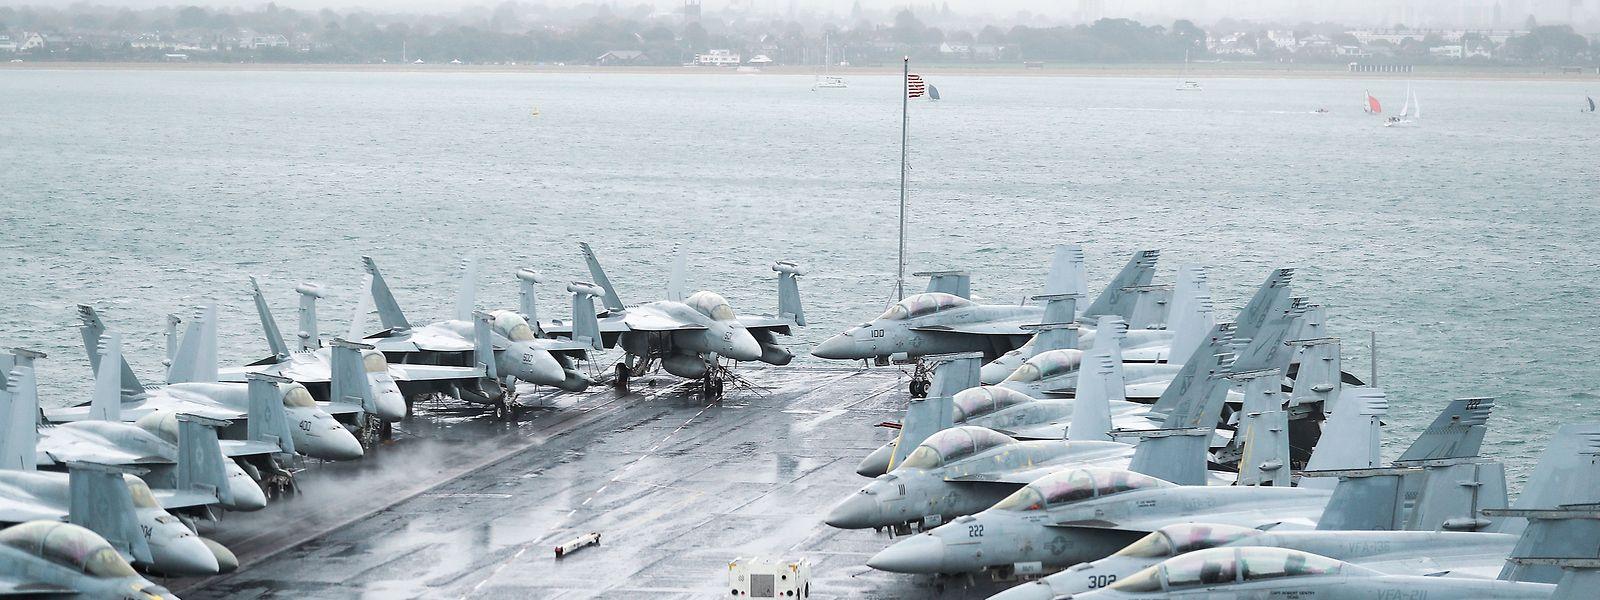 F-18-Jets säumen das Deck des Flugzeugträgers USS «Harry S. Truman» in Stokes Bay, Hampshire.